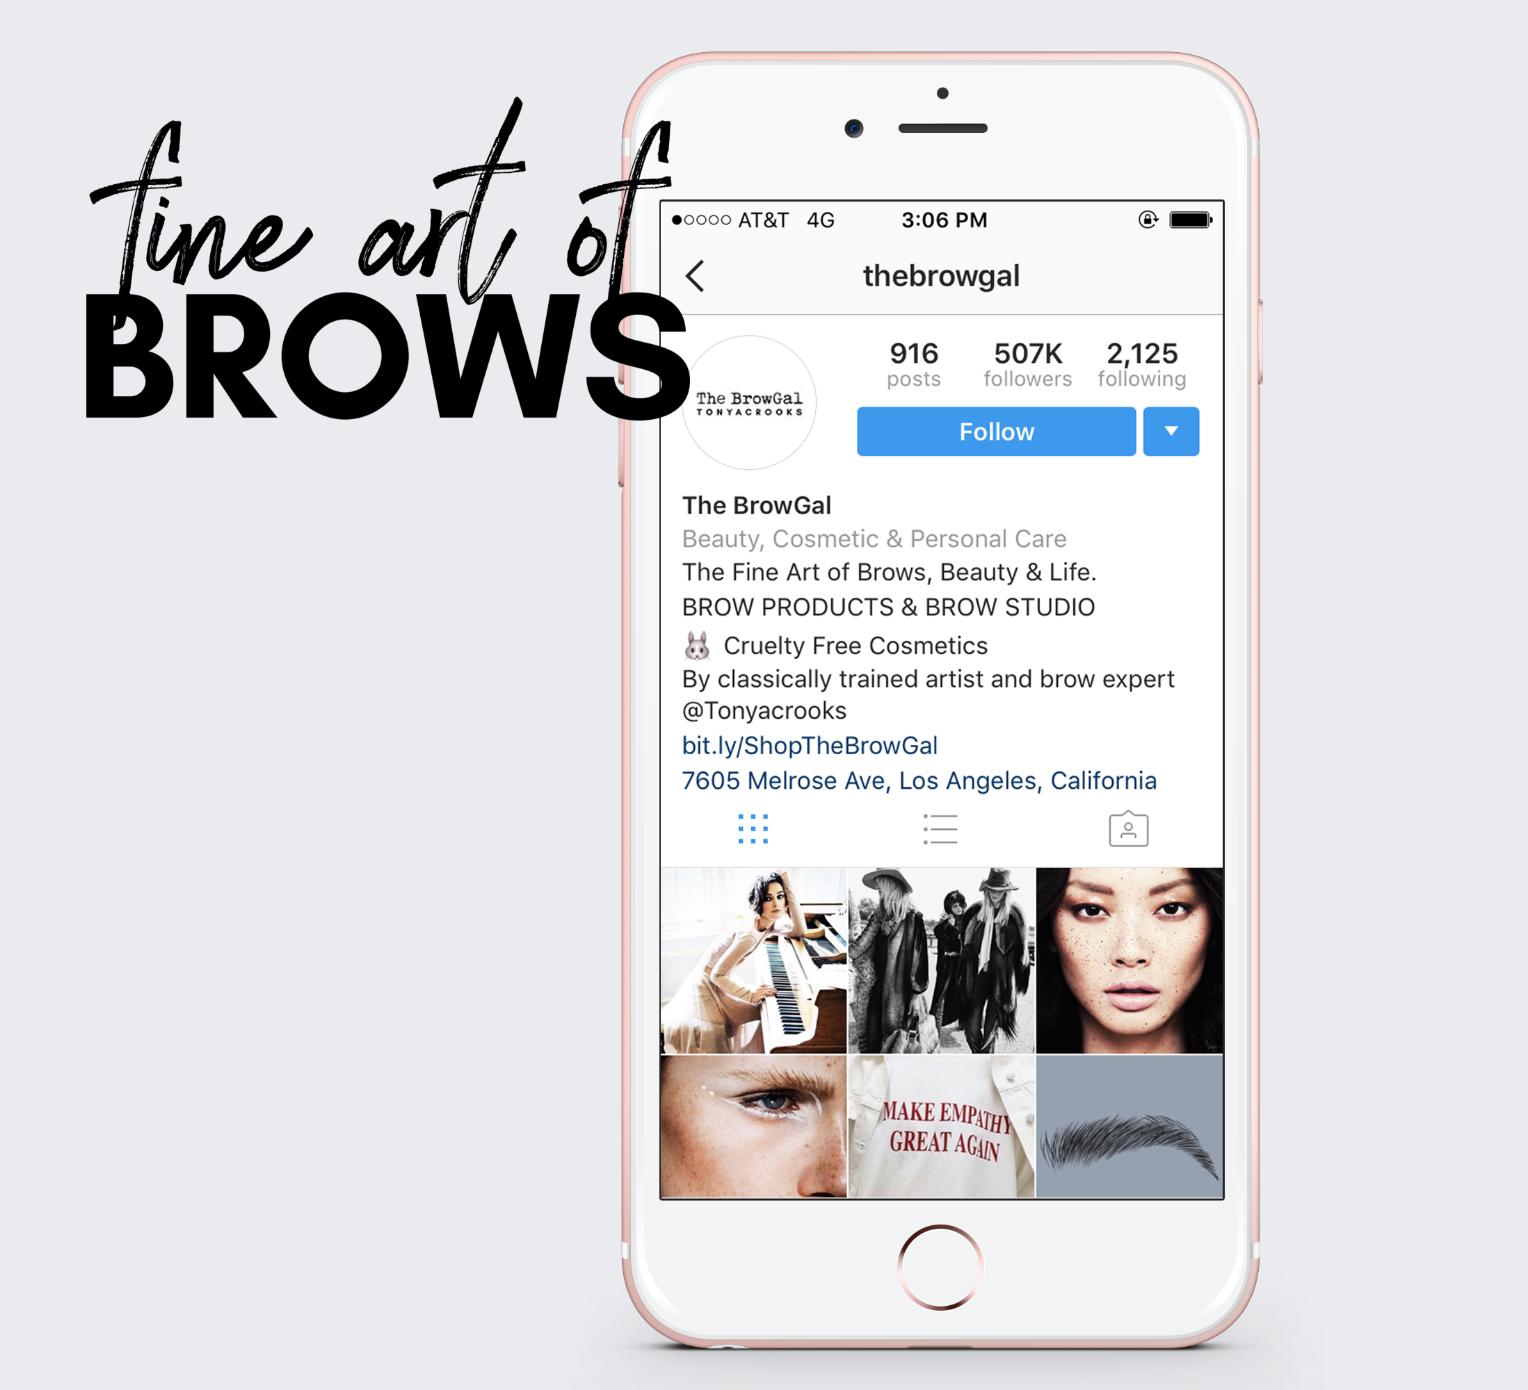 NEW MEDIA DEVELOPMENT - Instagram, Brand, Campaign Concept and New Media Platform Development